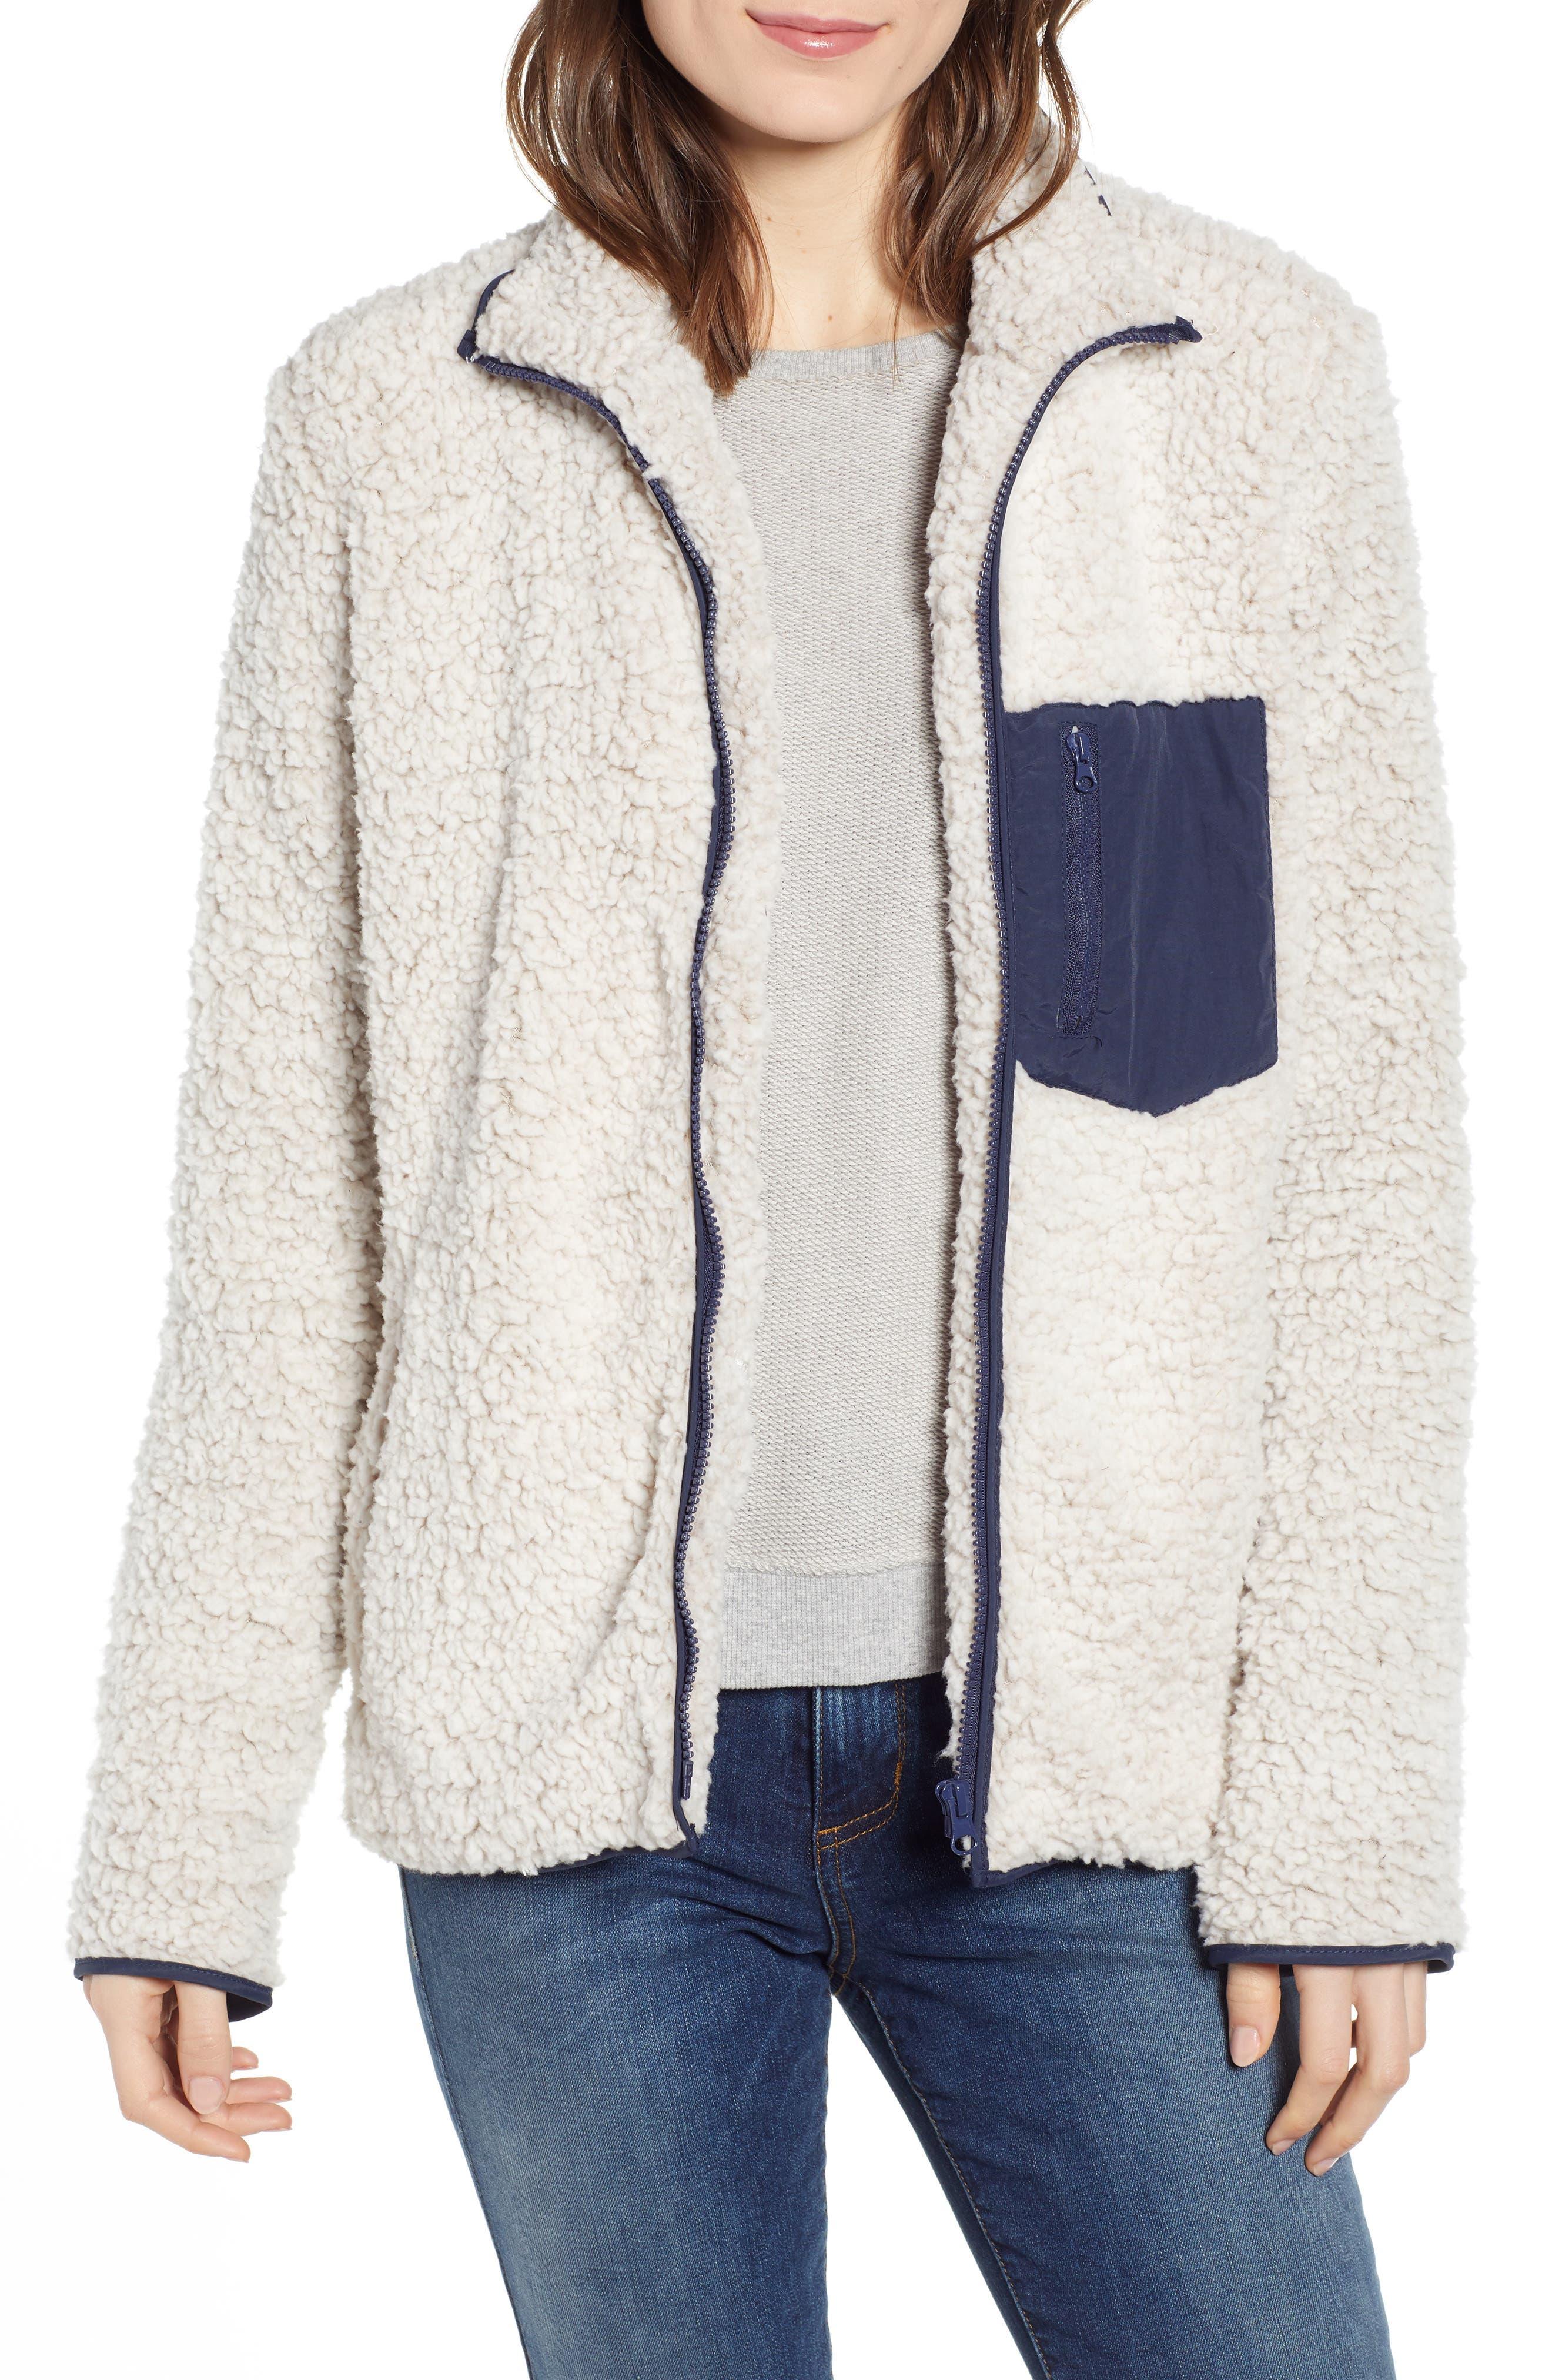 THREAD & SUPPLY Bleeker Fleece Jacket, Main, color, IVORY INDIGO